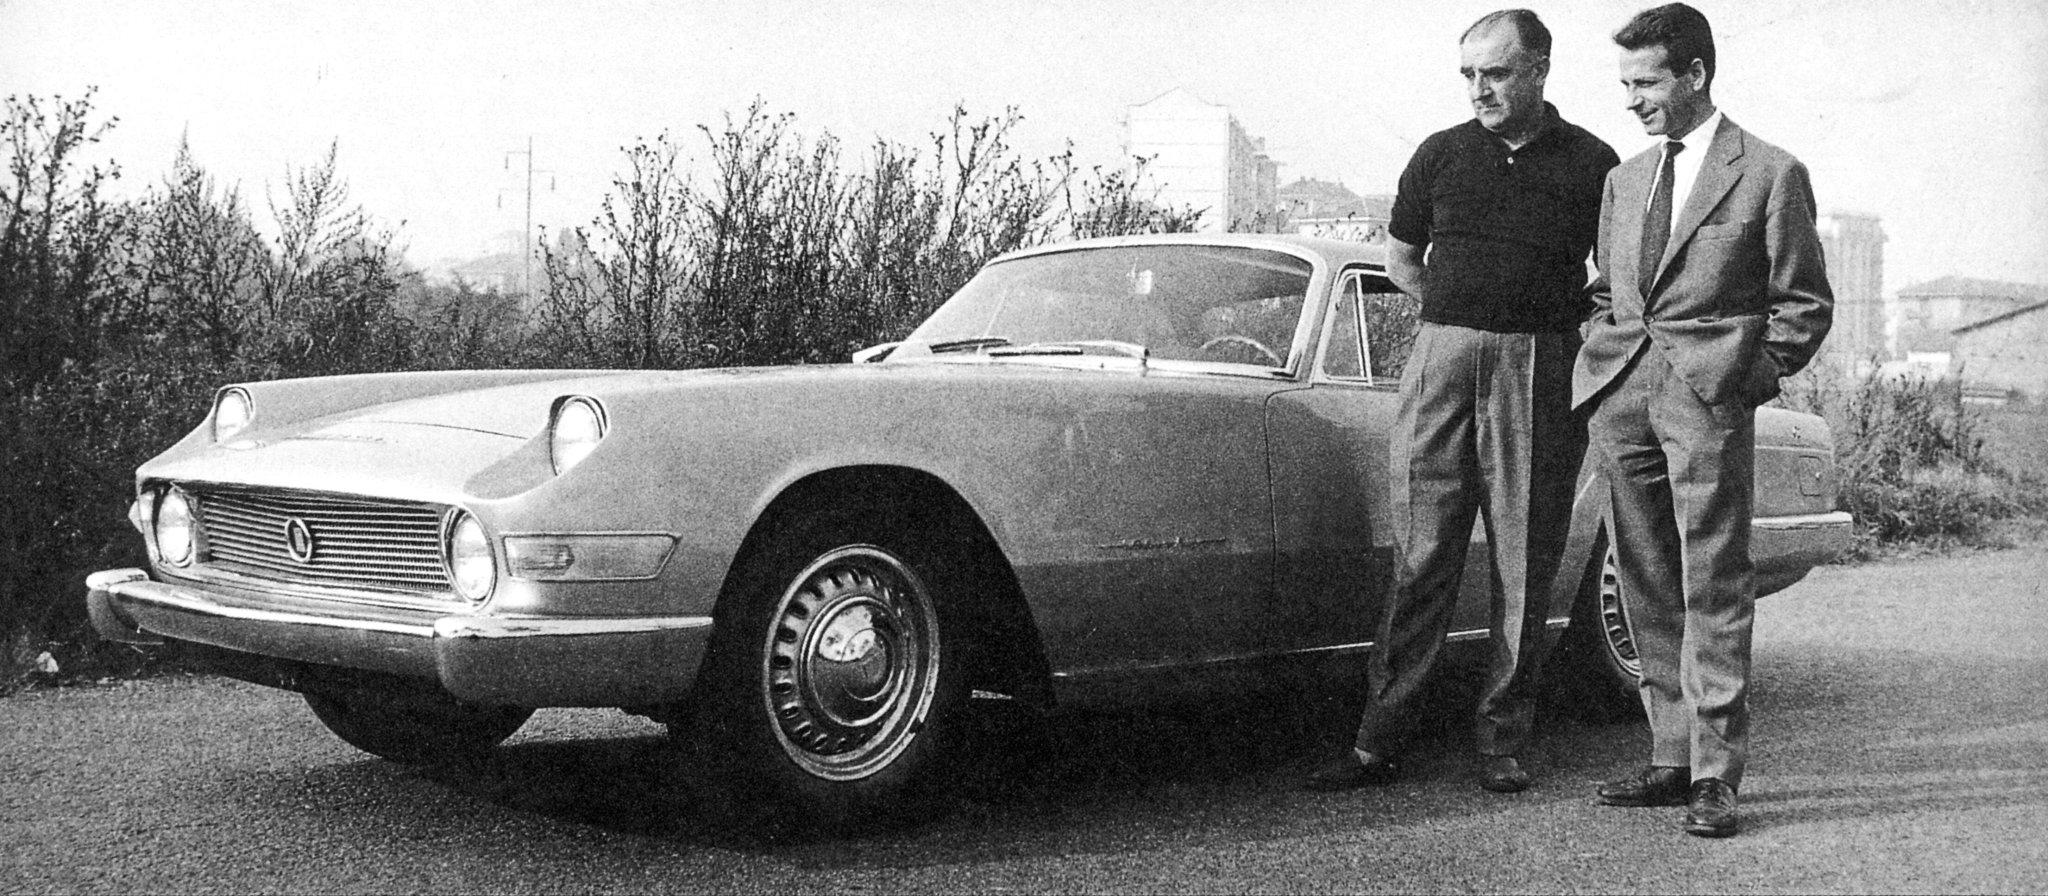 Giovanni Michelotti Is The Greatest Automotive Designer You've Never Heard Of